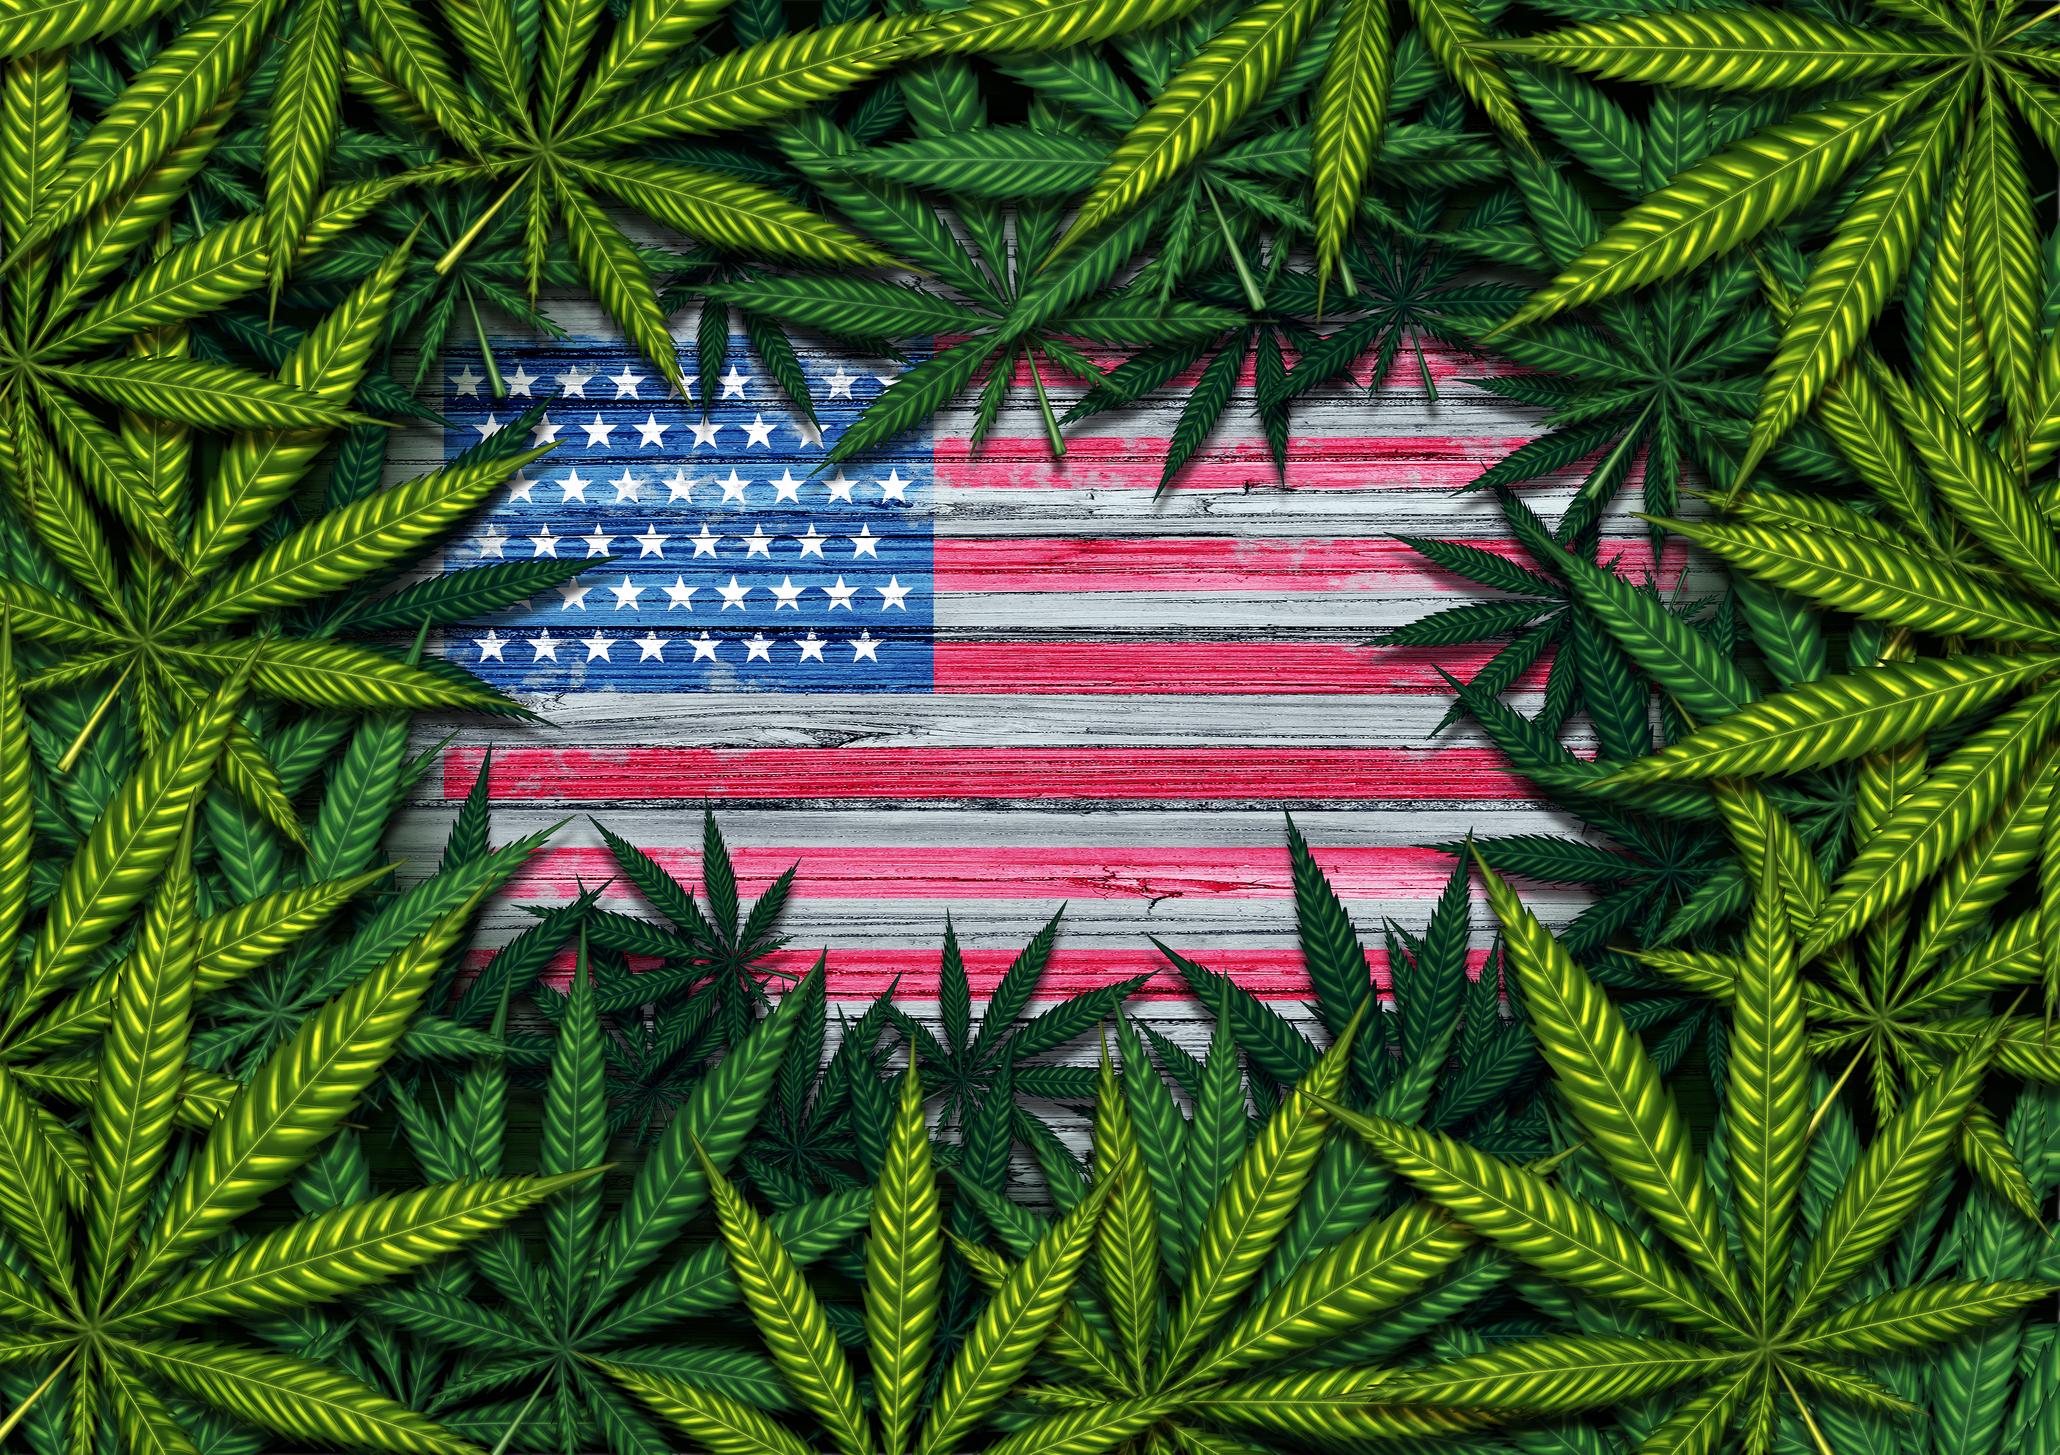 Rustic U.S. flag framed by a pile of marijuana leaves